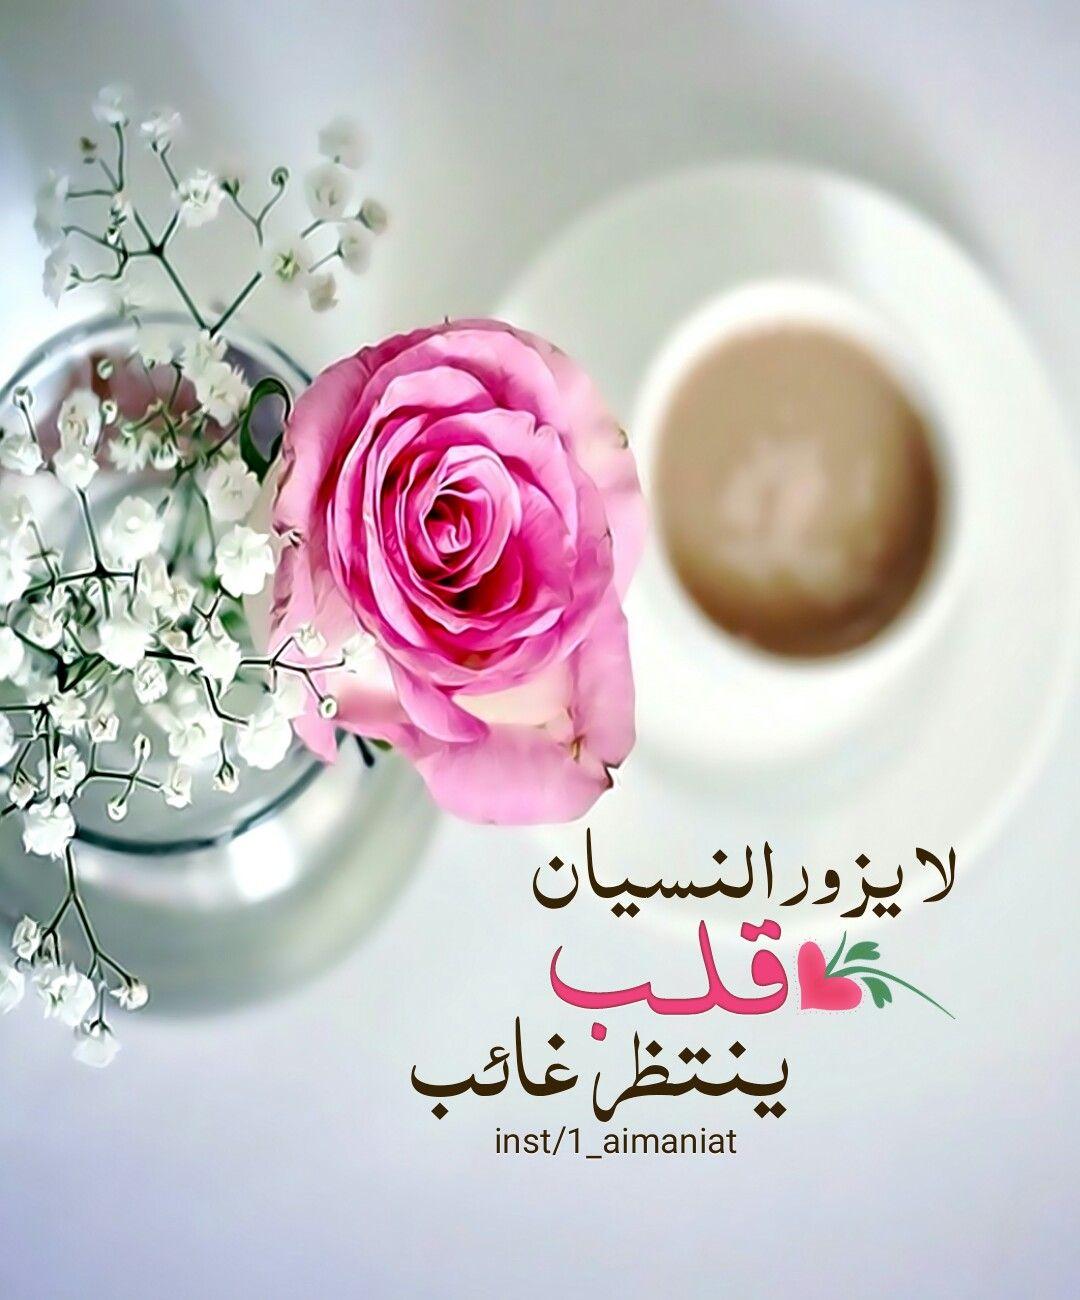 Pin By Um Ahmad On ادعية وتسابيح Instagram Posts Instagram Photo